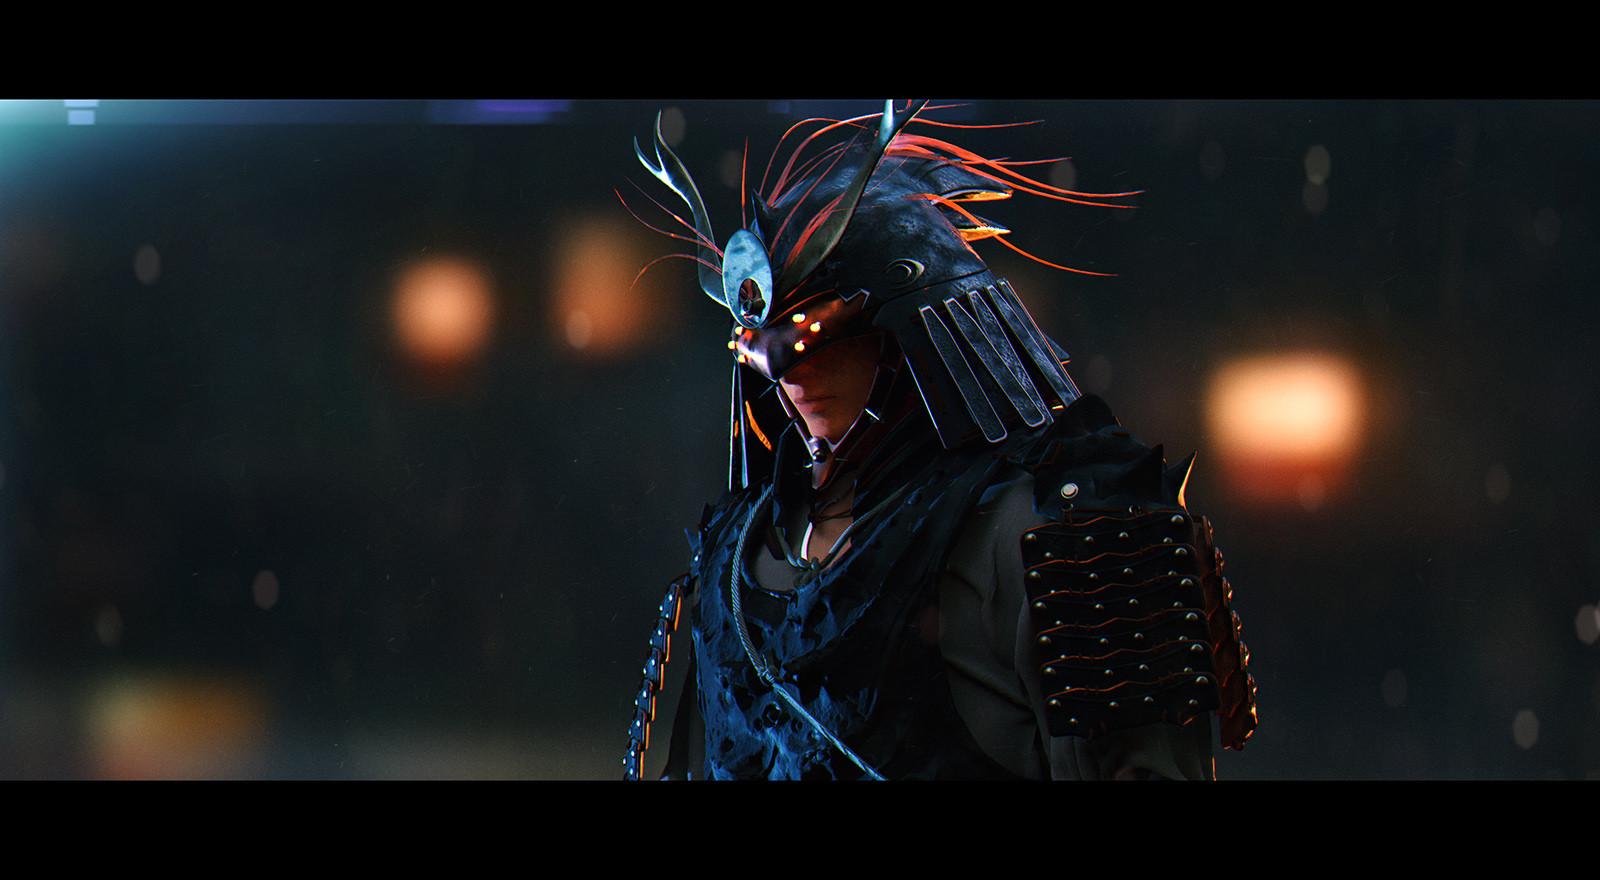 Lorenz hideyoshi ruwwe samurai cine1 s